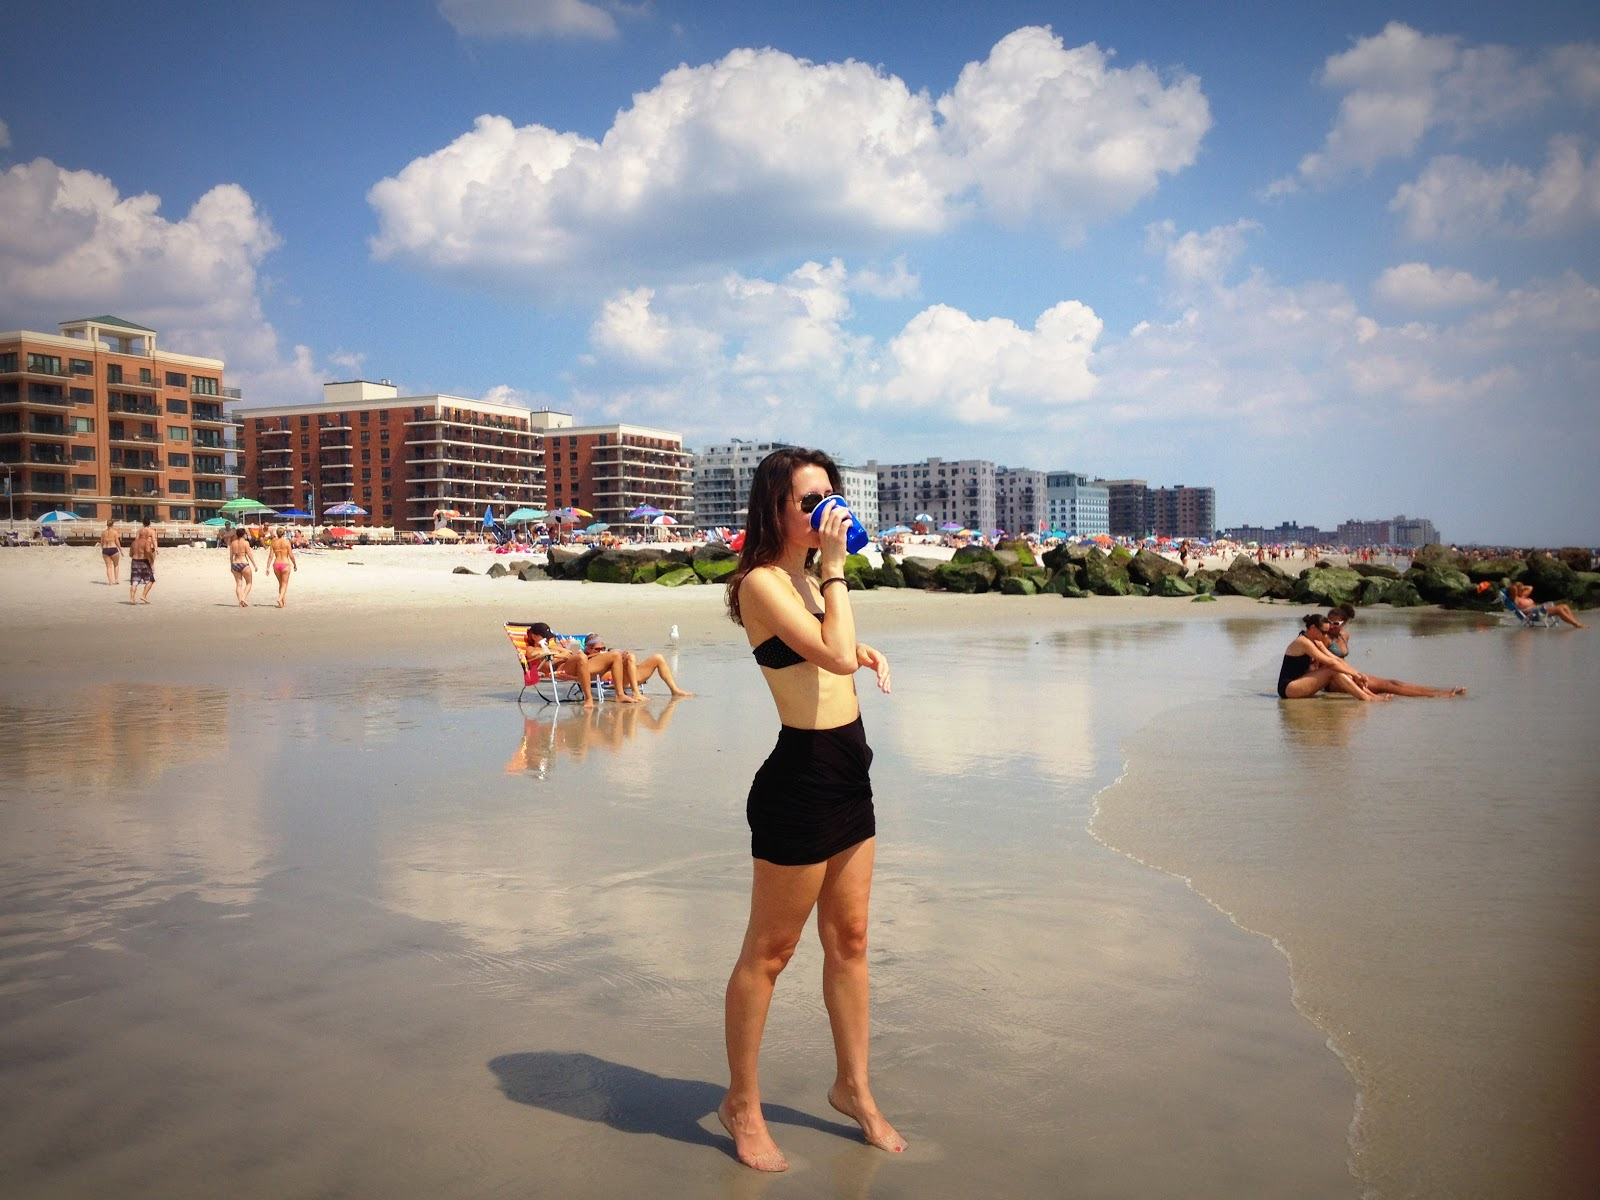 http://4.bp.blogspot.com/-zgJVWK3pVH0/UEa058yjrYI/AAAAAAAAGbI/Qaejj1RPOSY/s1600/the+perfect+beach+outfit+fashion+and+beats+street+style+black+bathing+suit+chloe+white+floppy+hat+h&m+jelly+sandals.JPG